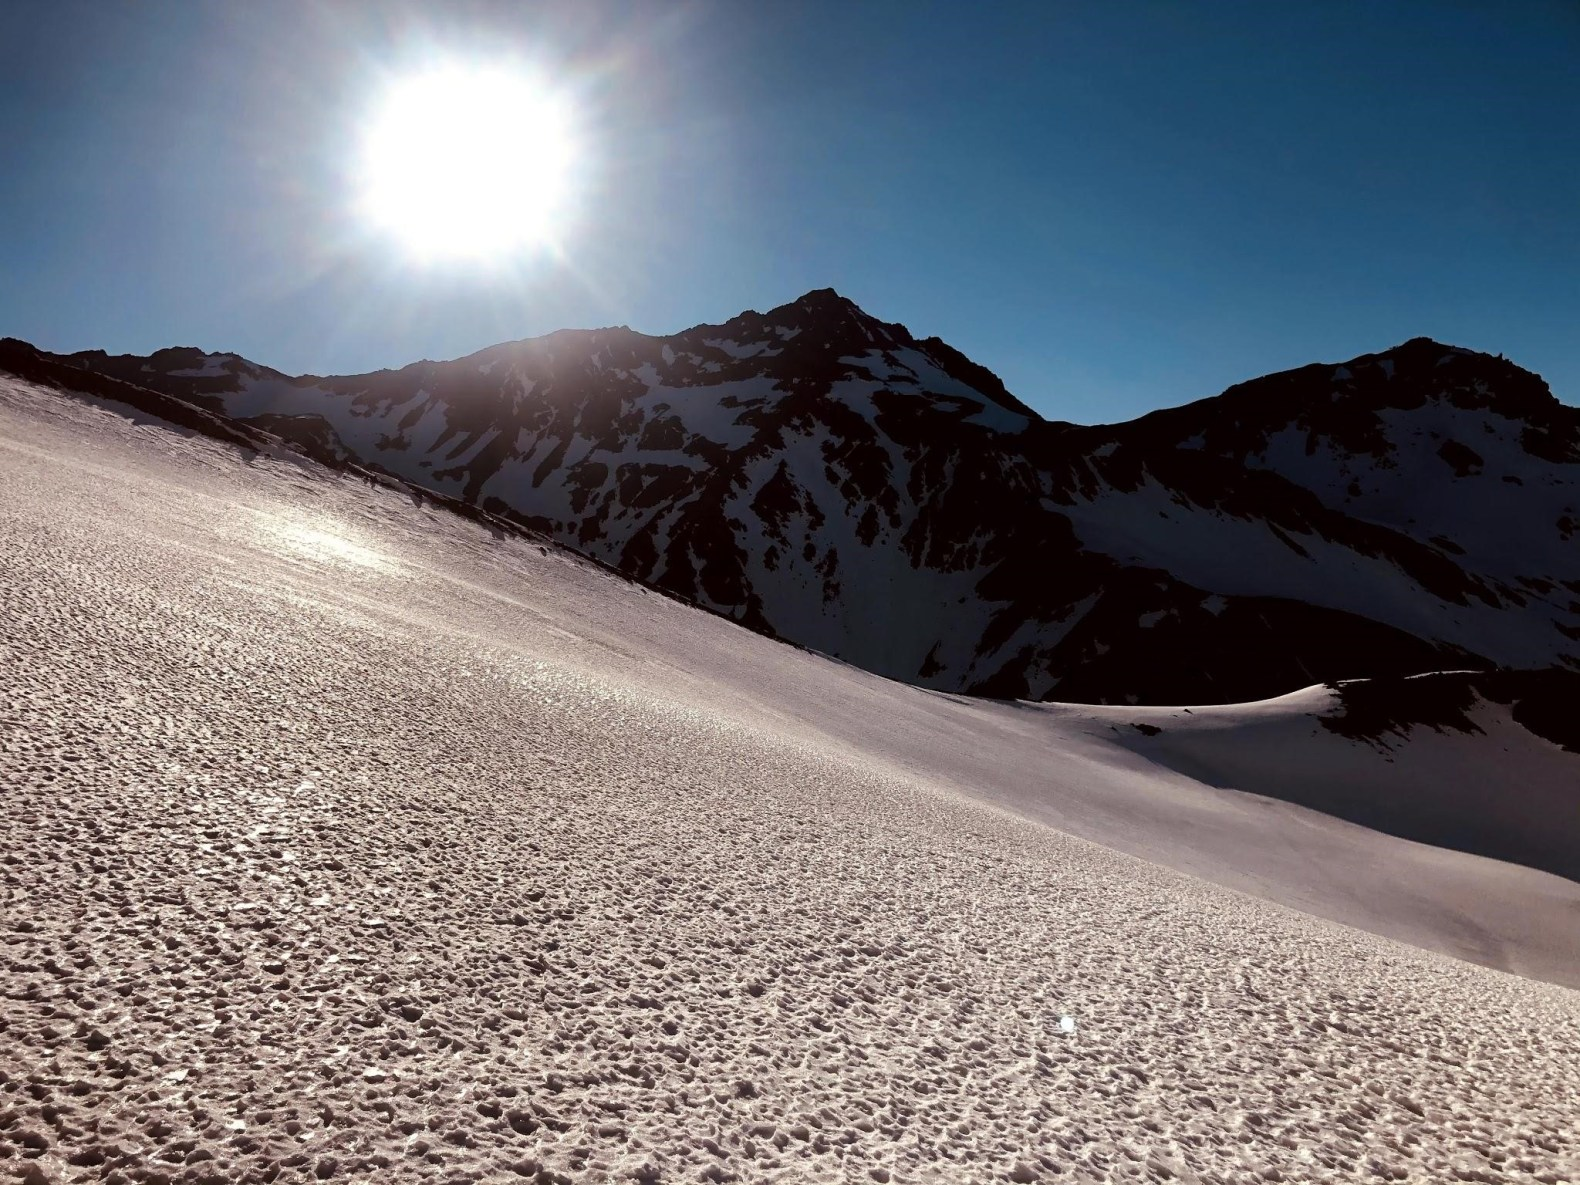 Salida en Ski de Randonnée al Valle de las Damas – Relato de Philippe Boisier